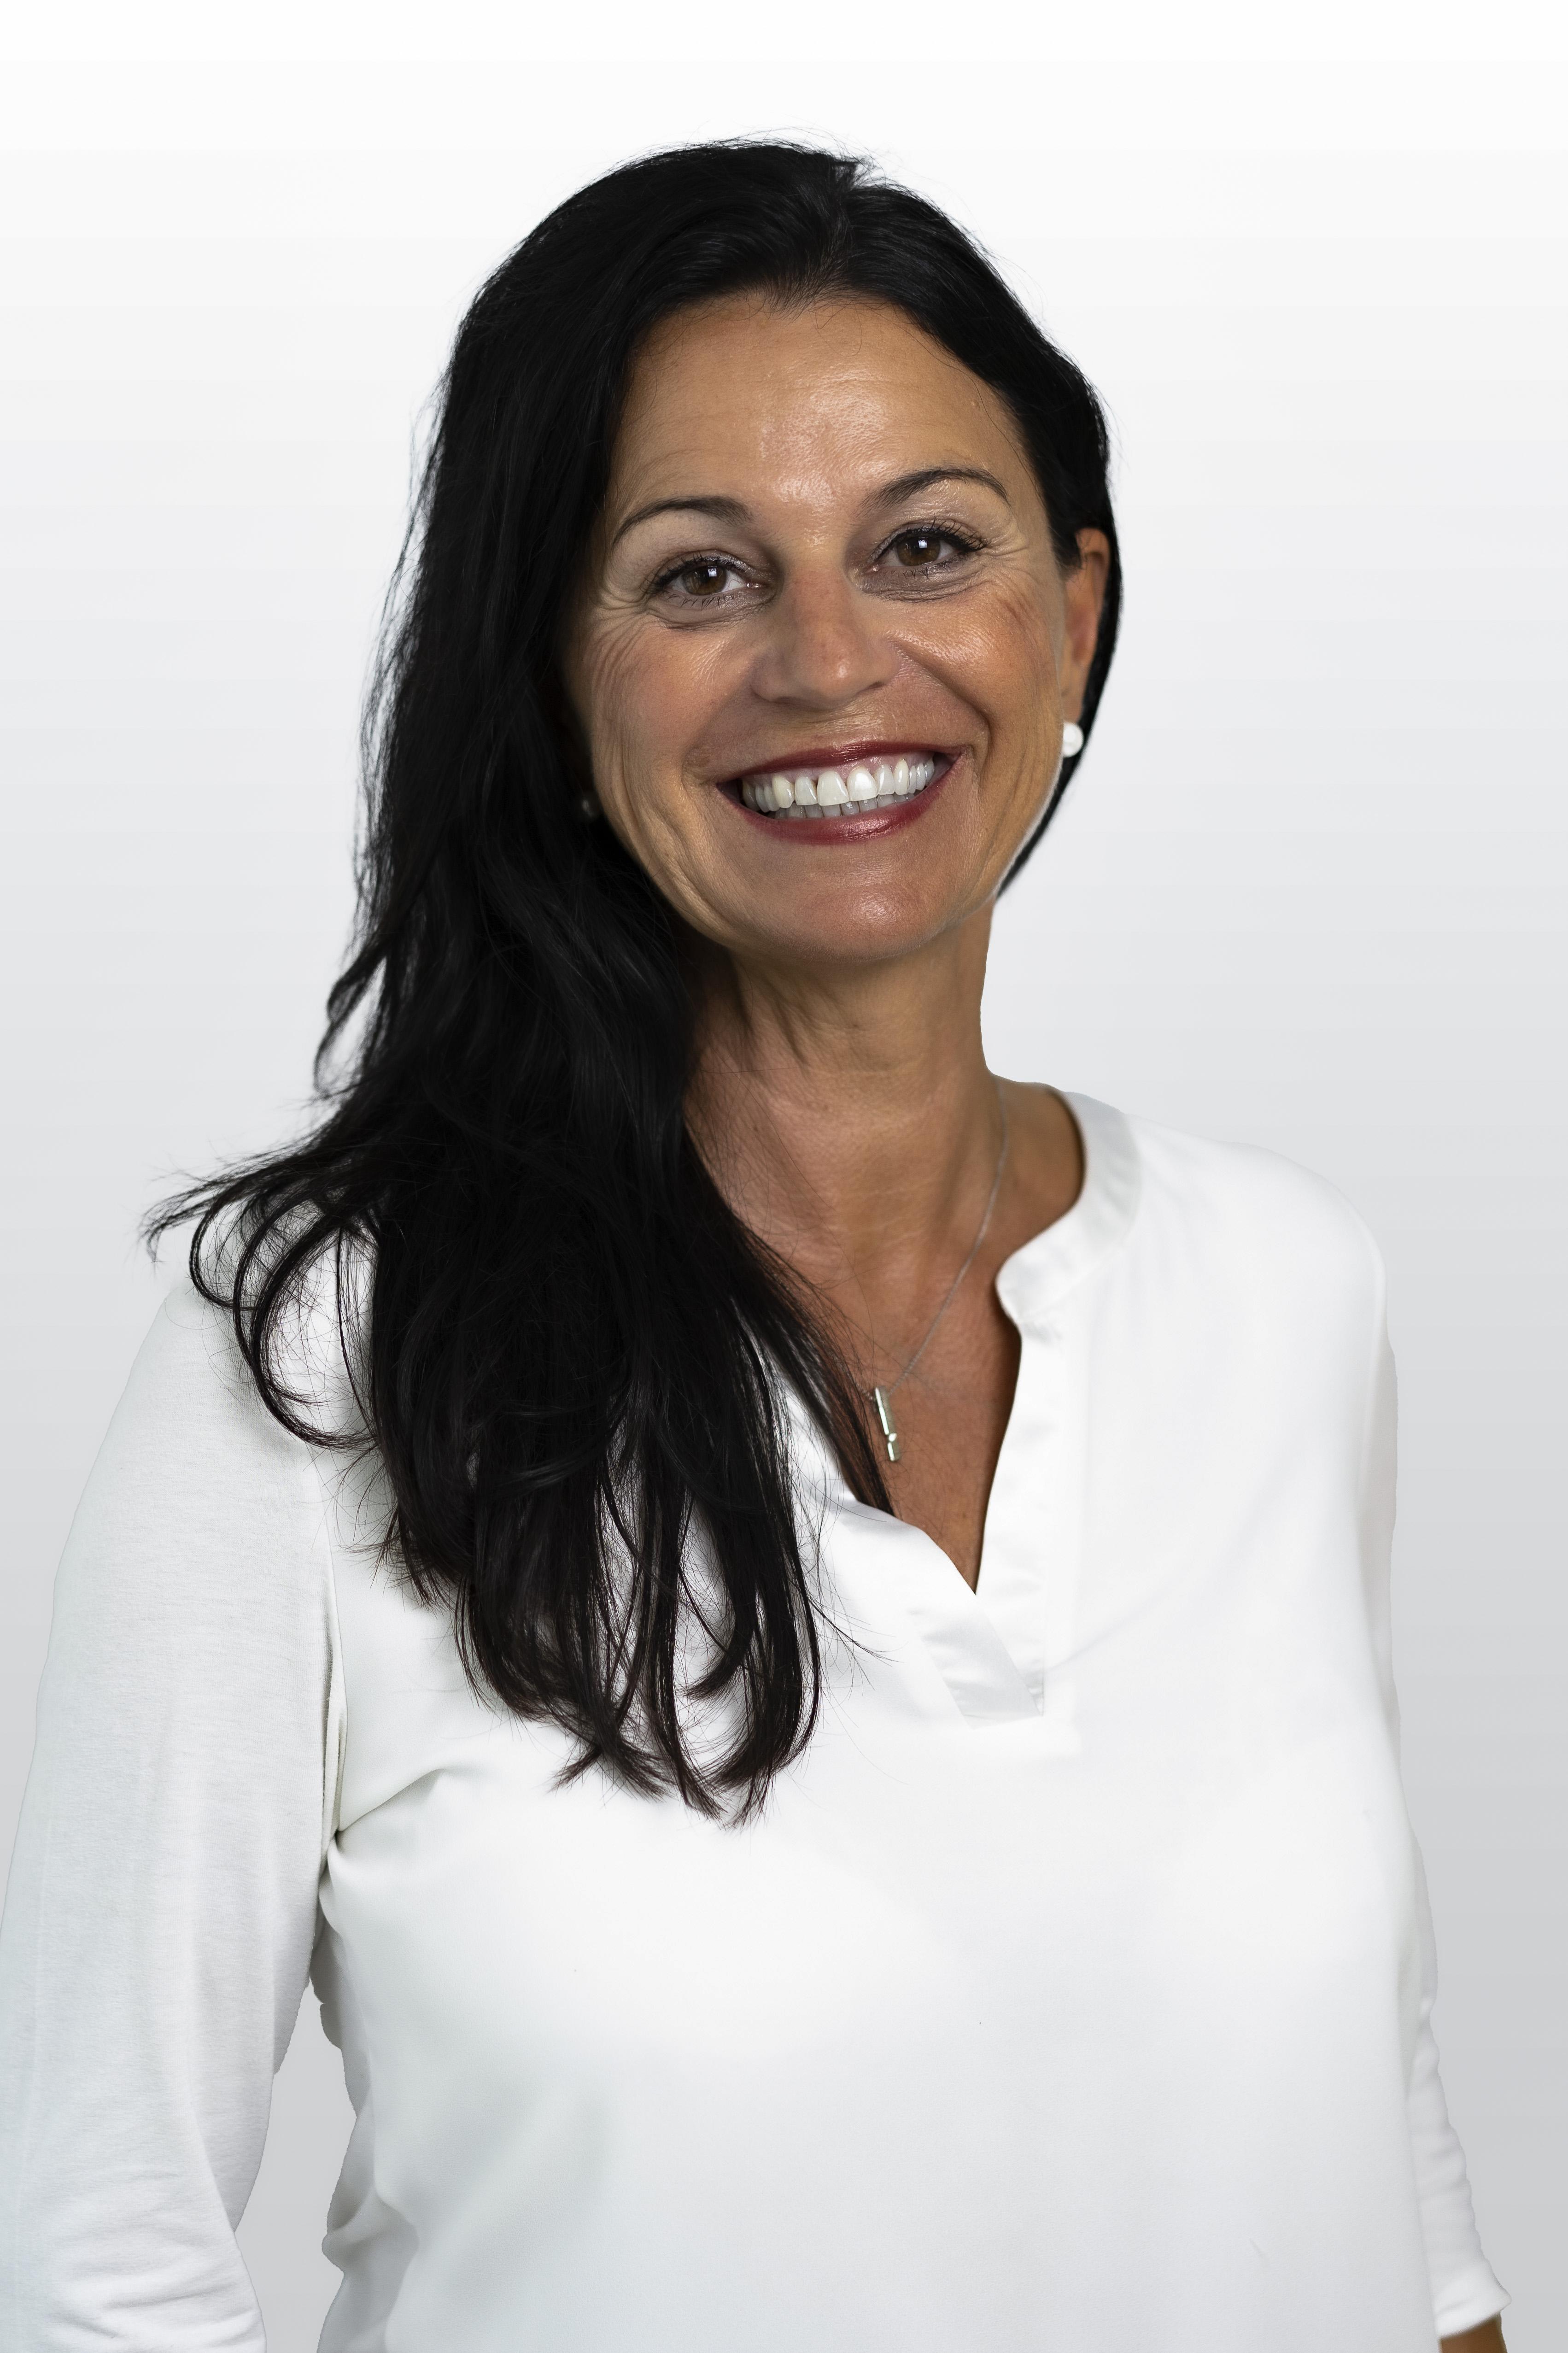 Nicole Hebel-Heberling